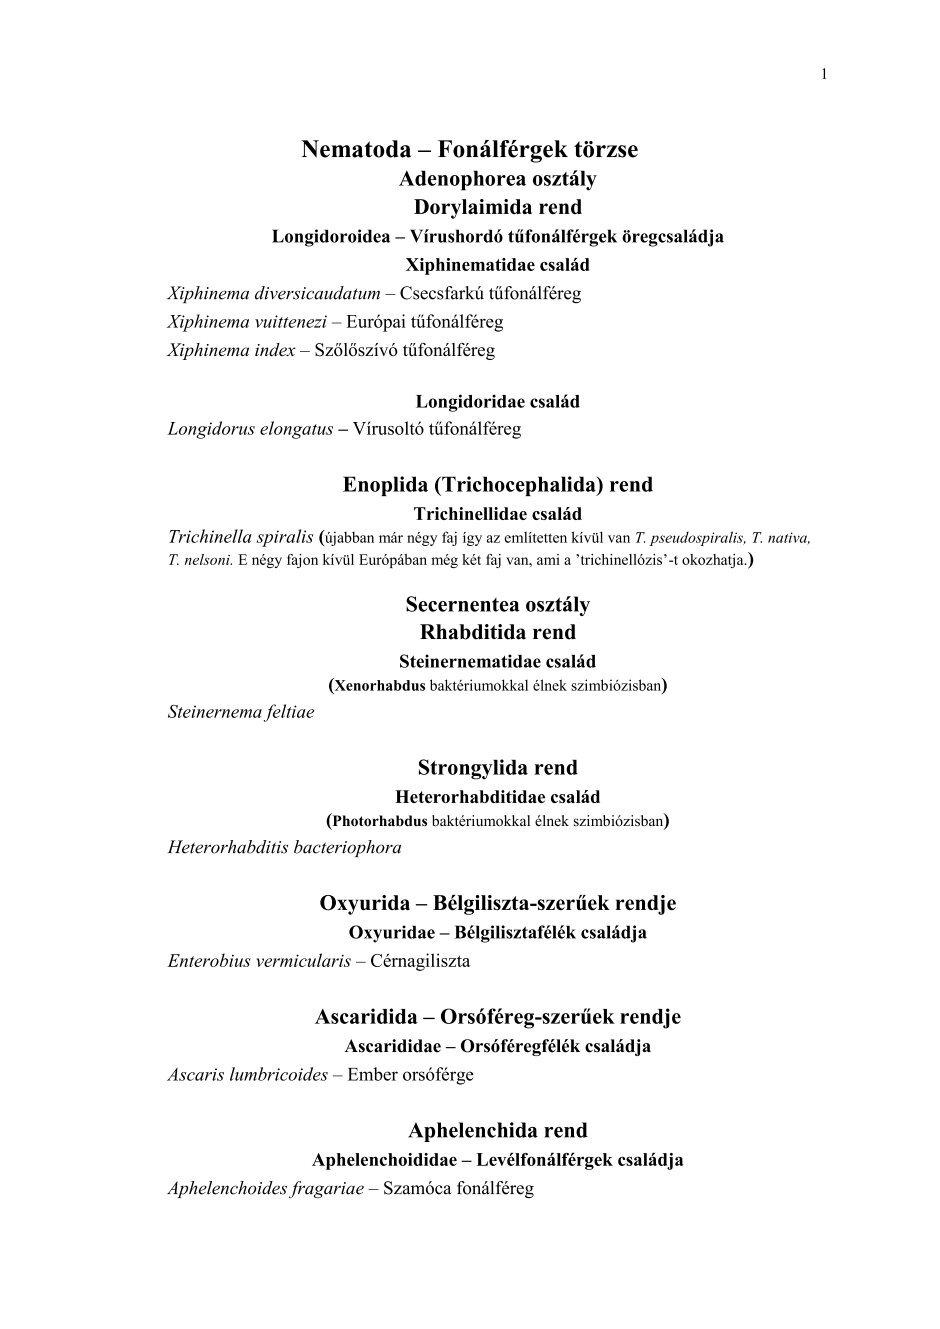 enterobius vermicularis rendszertan)